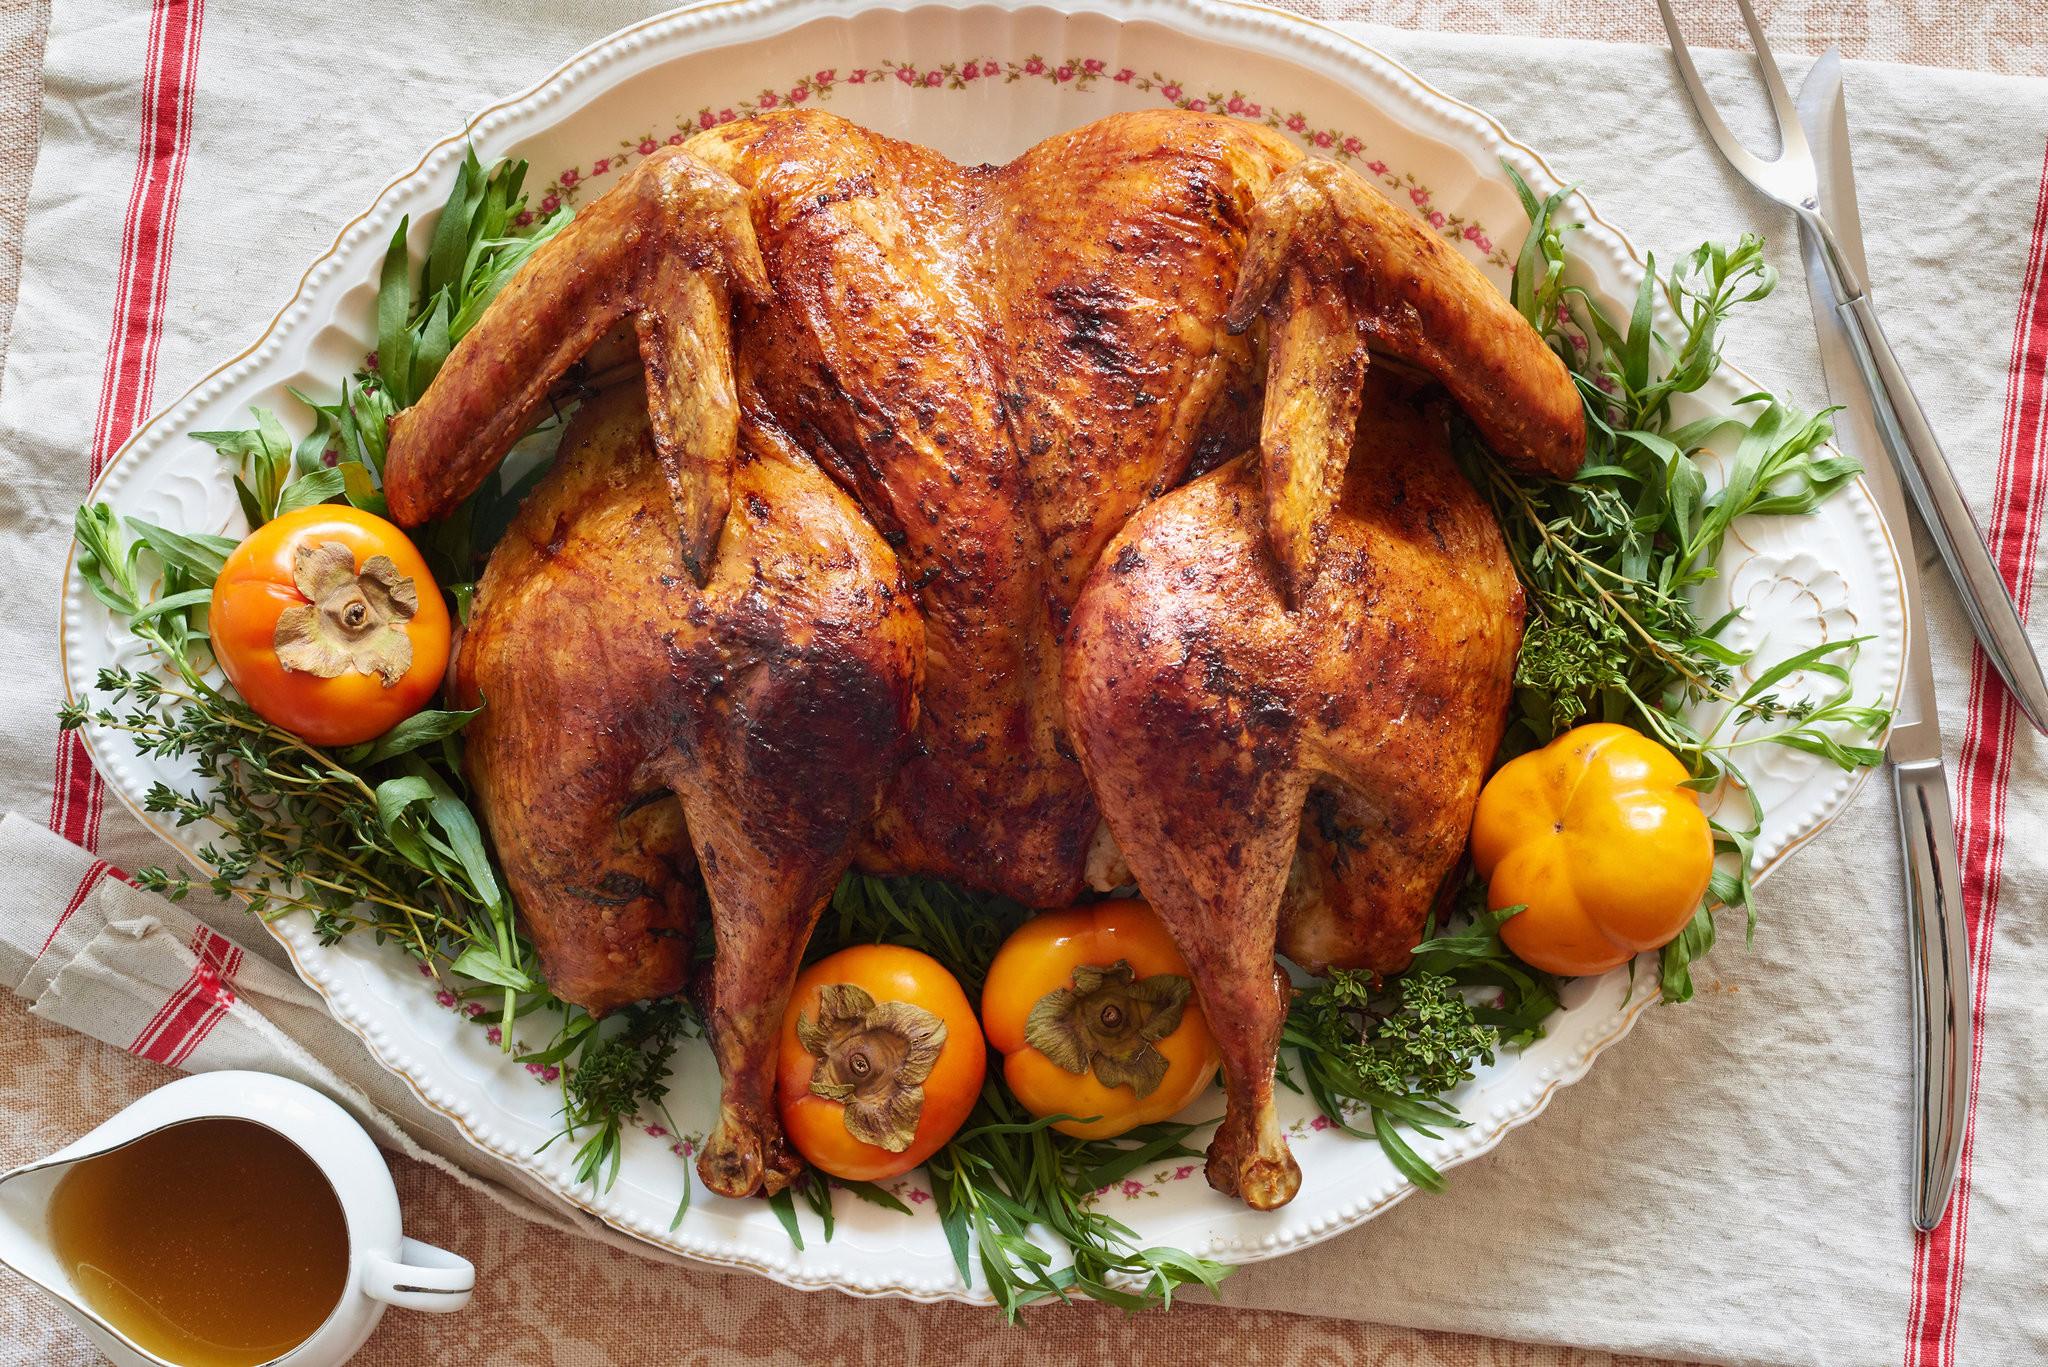 Roasted Turkey Recipes Thanksgiving  45 Minute Roast Turkey Recipe NYT Cooking